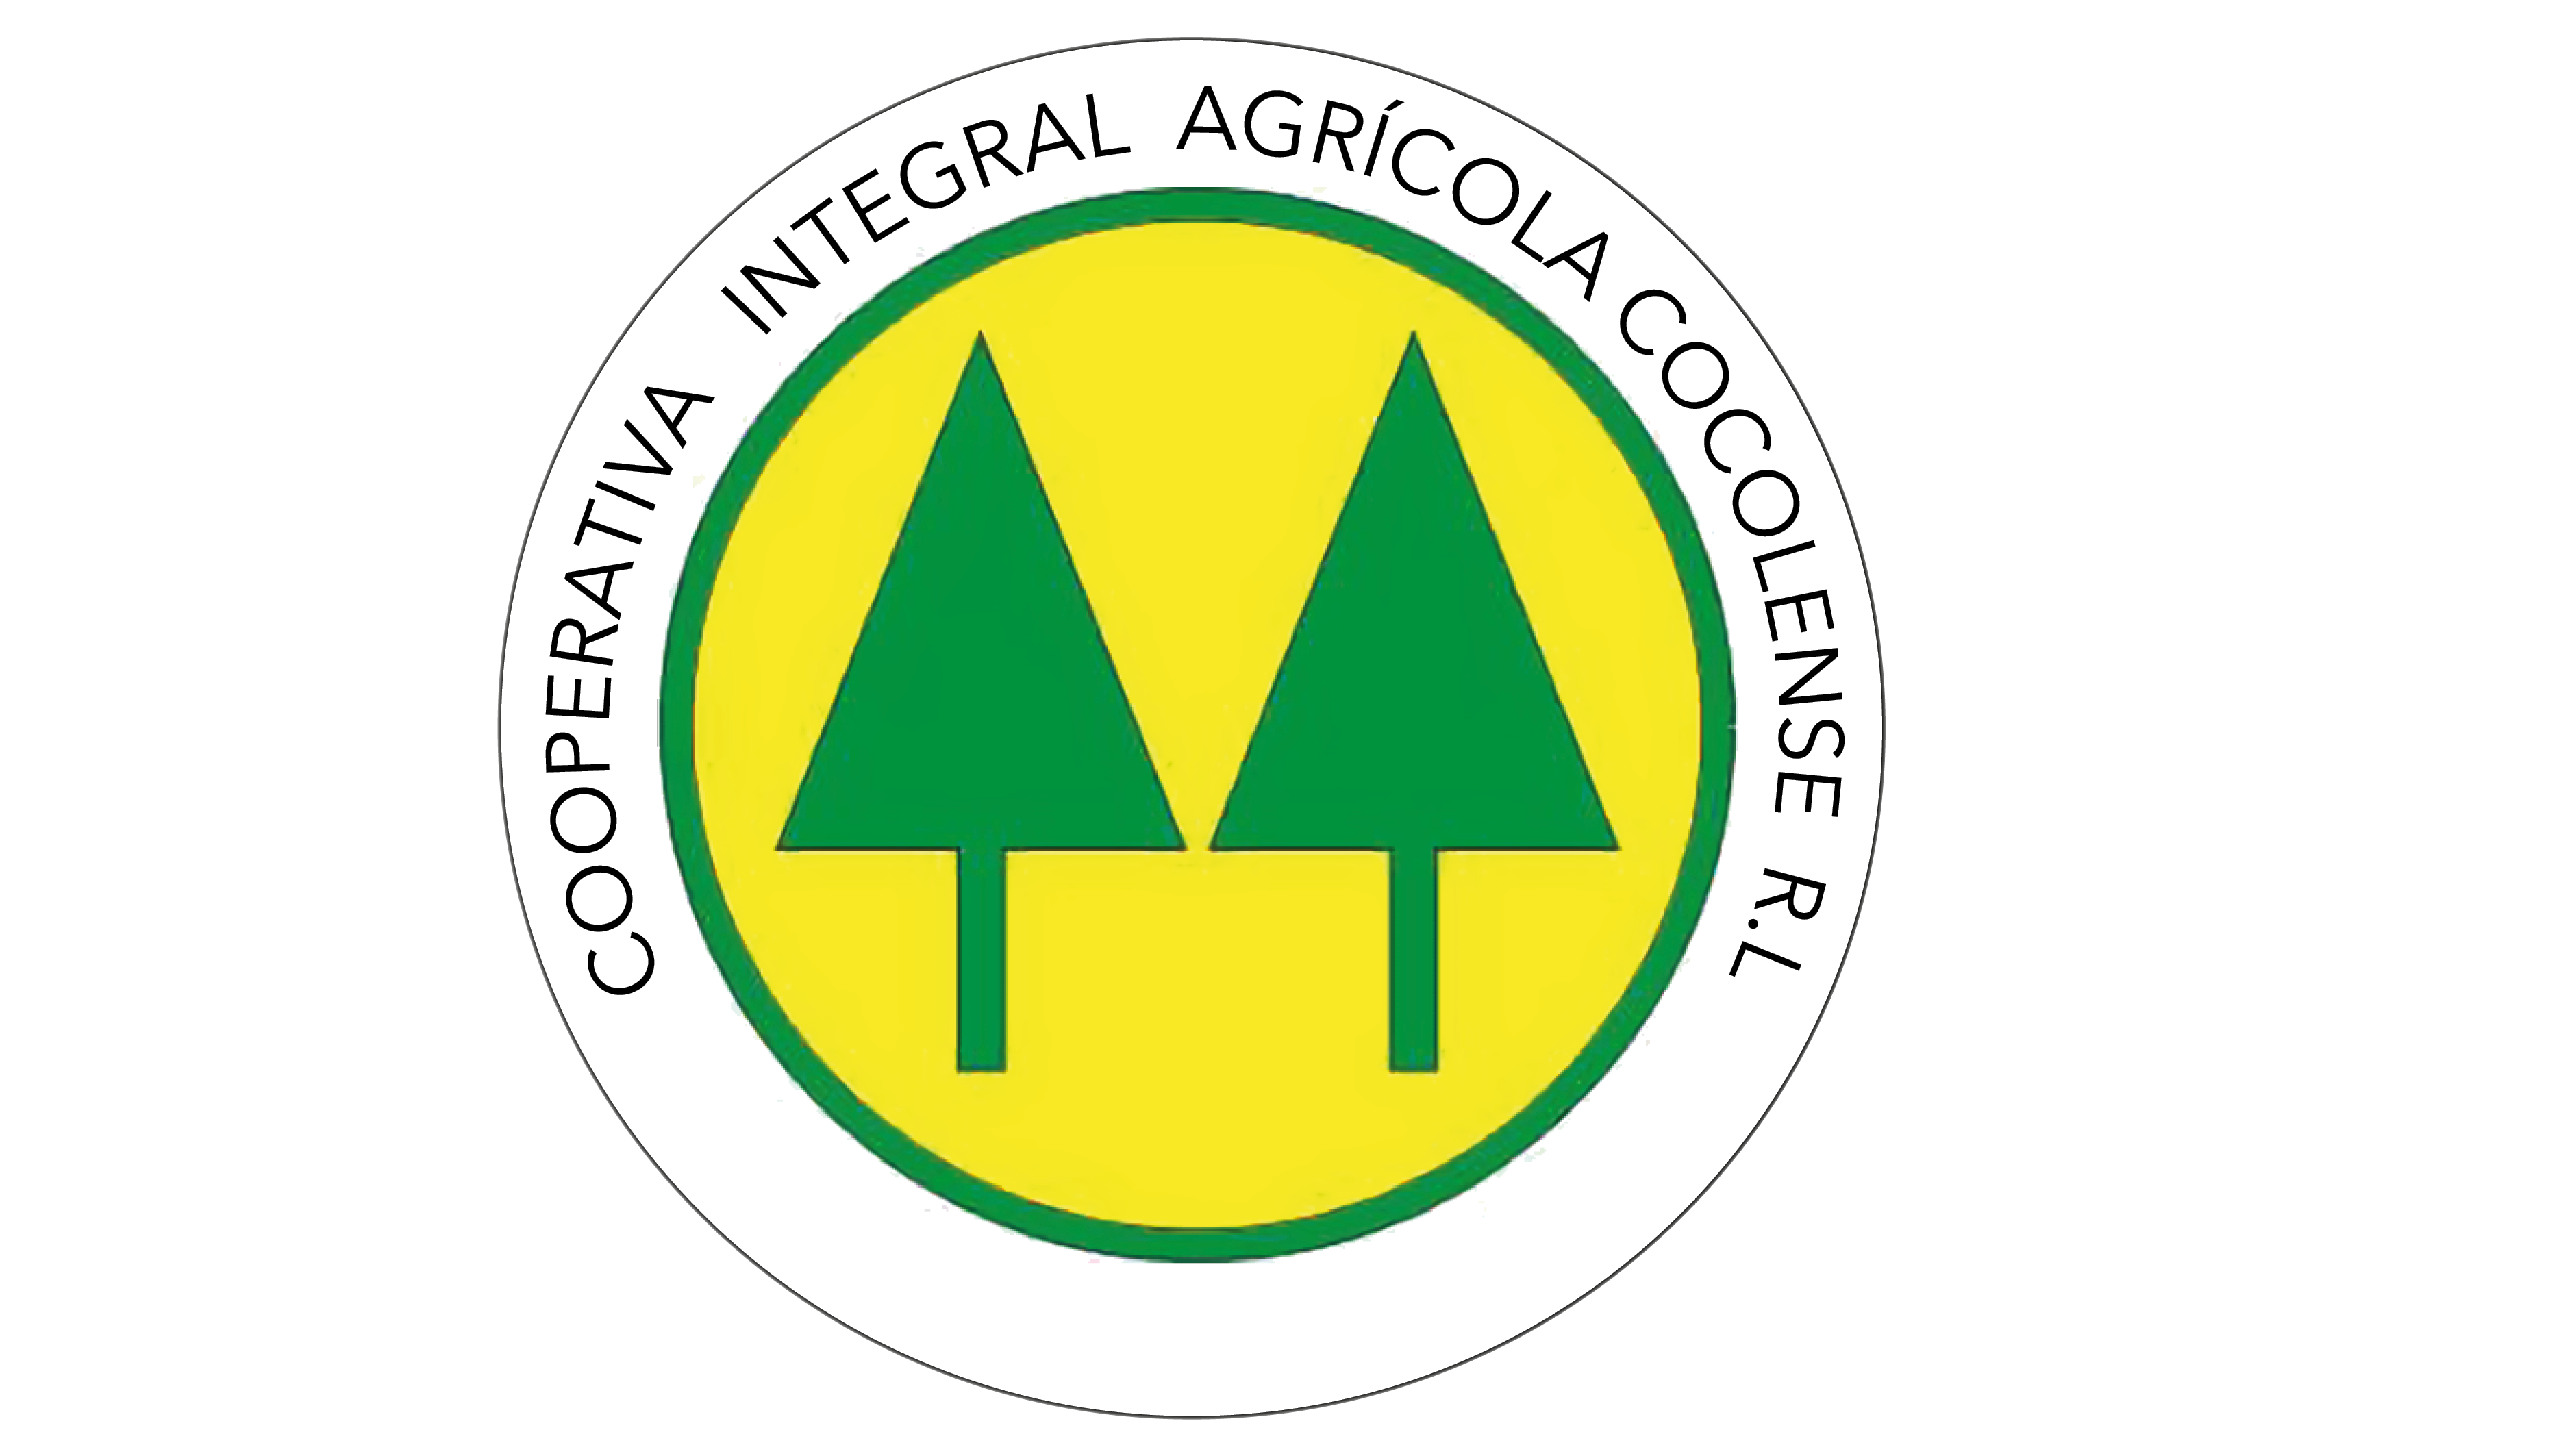 Cooperativa Integral Agrícola  Cocolense R.L.